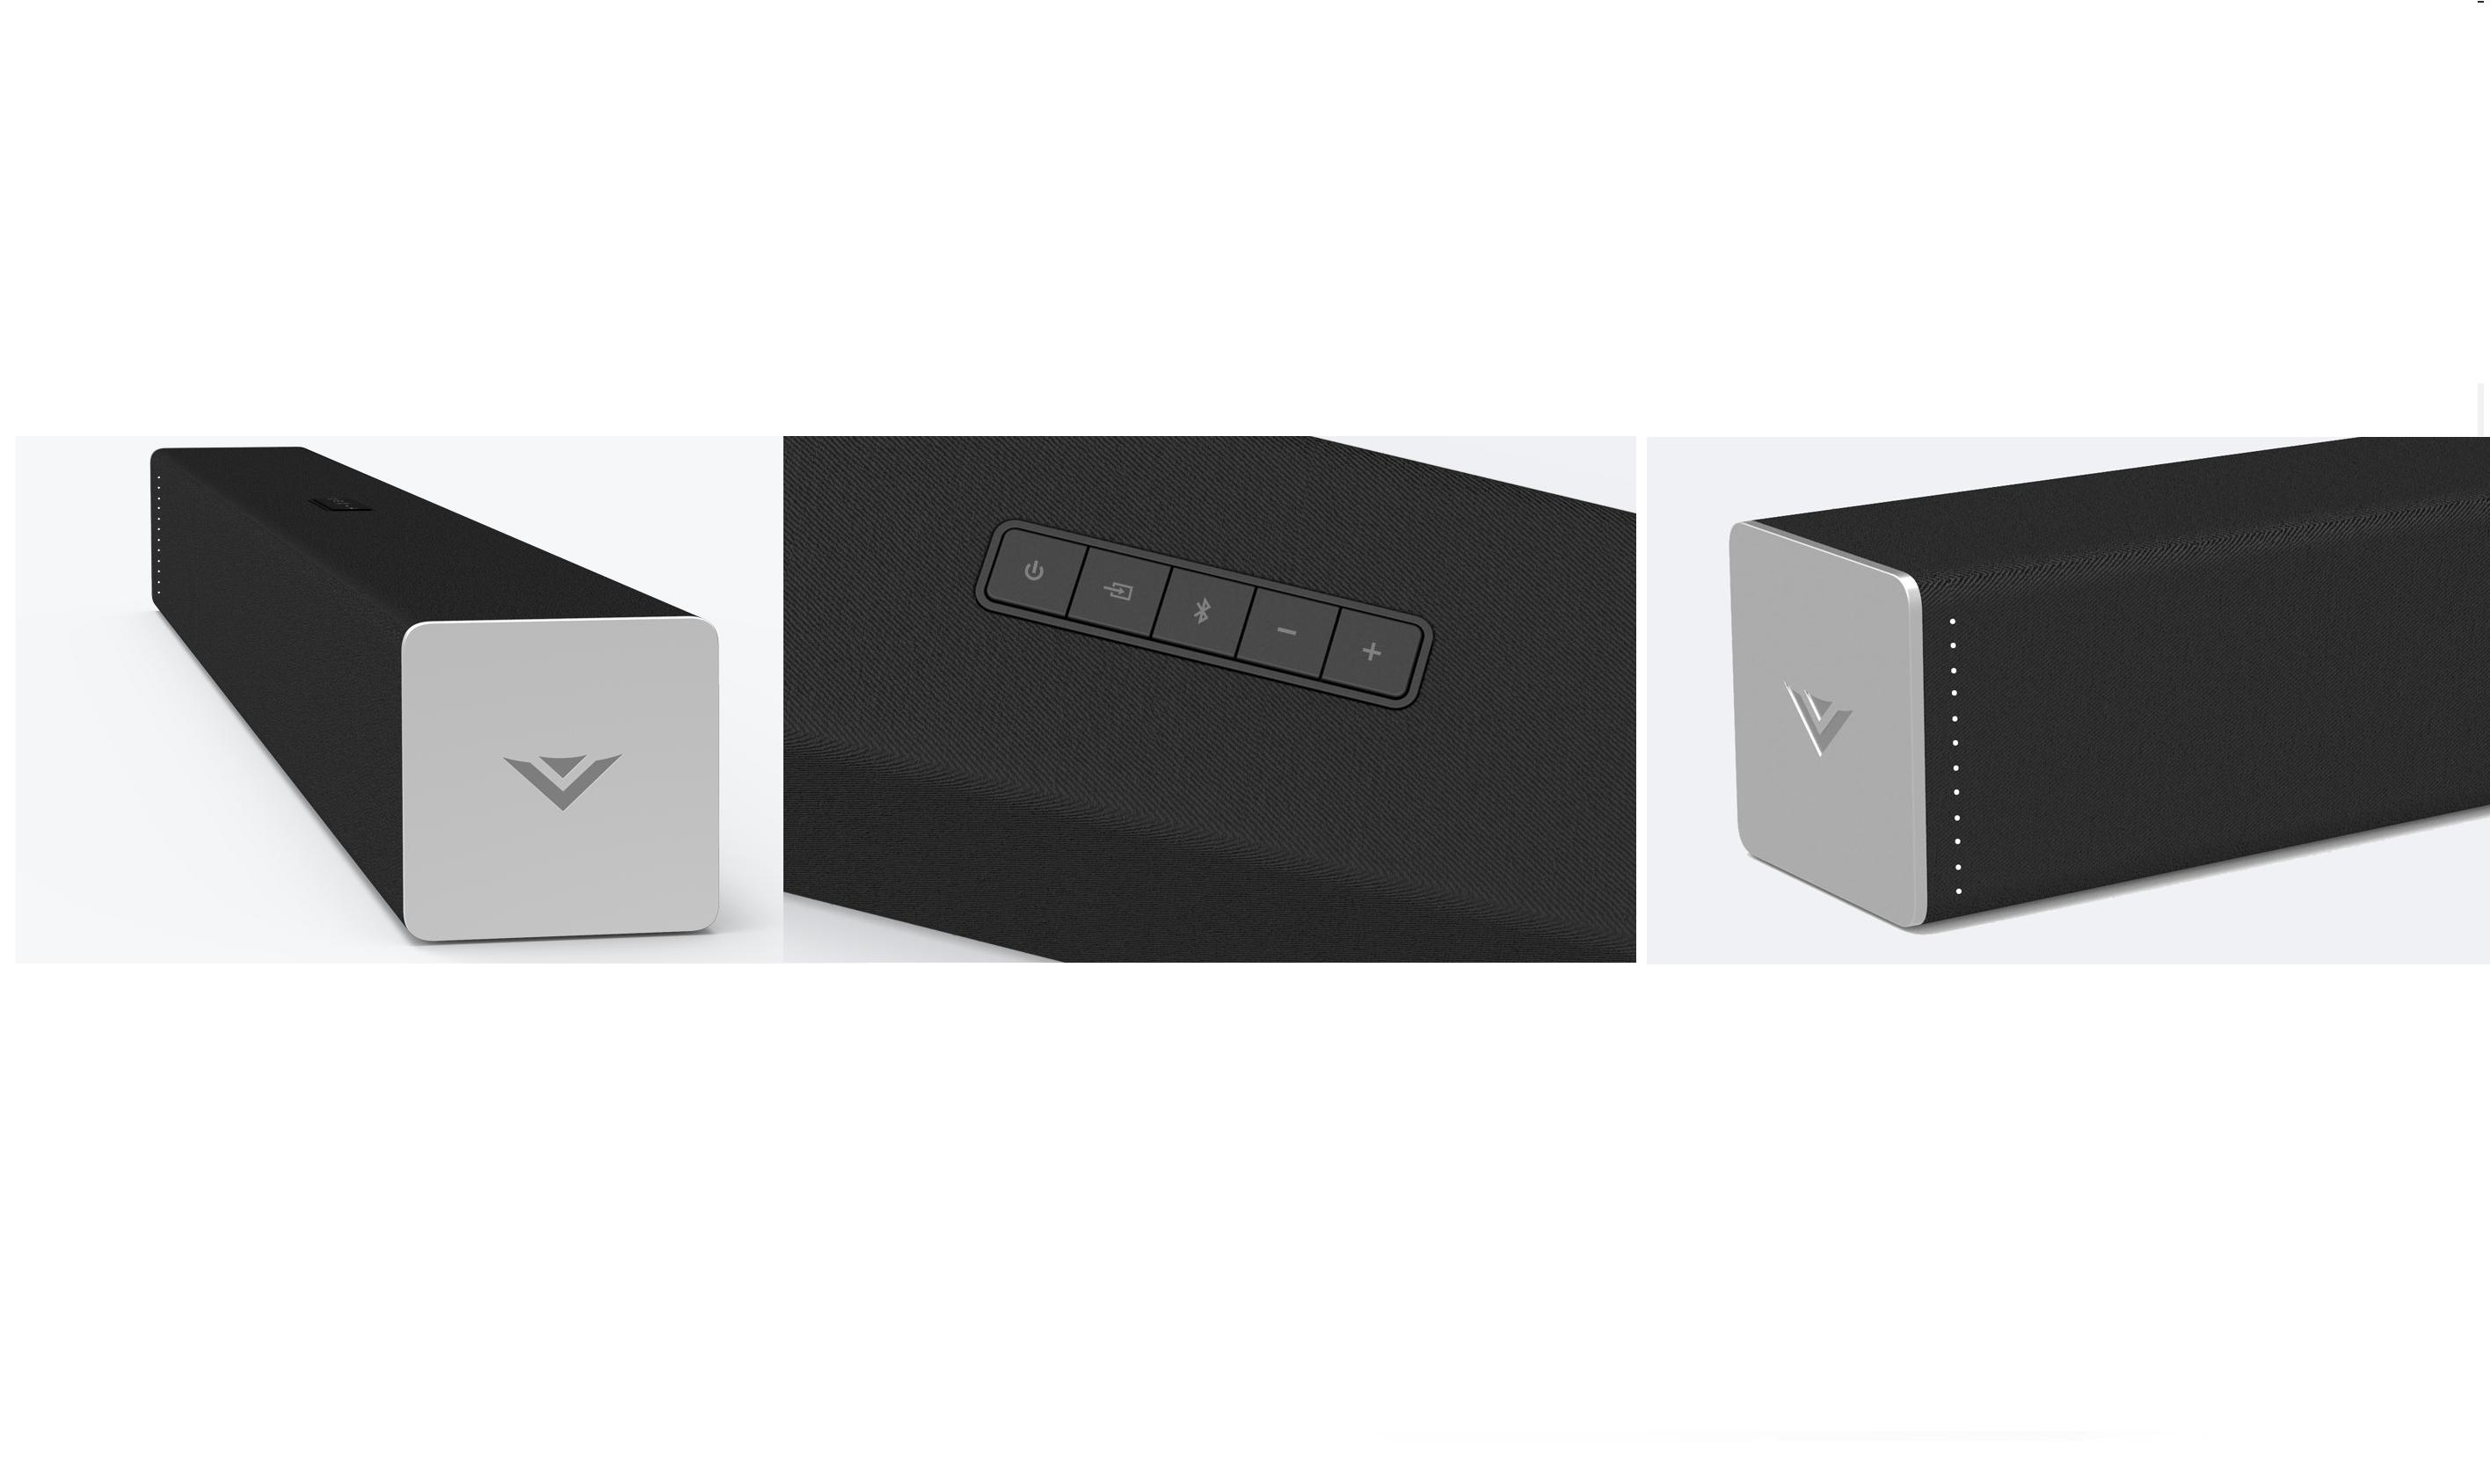 Vizio 2.1 Sound Bar System Group Shot